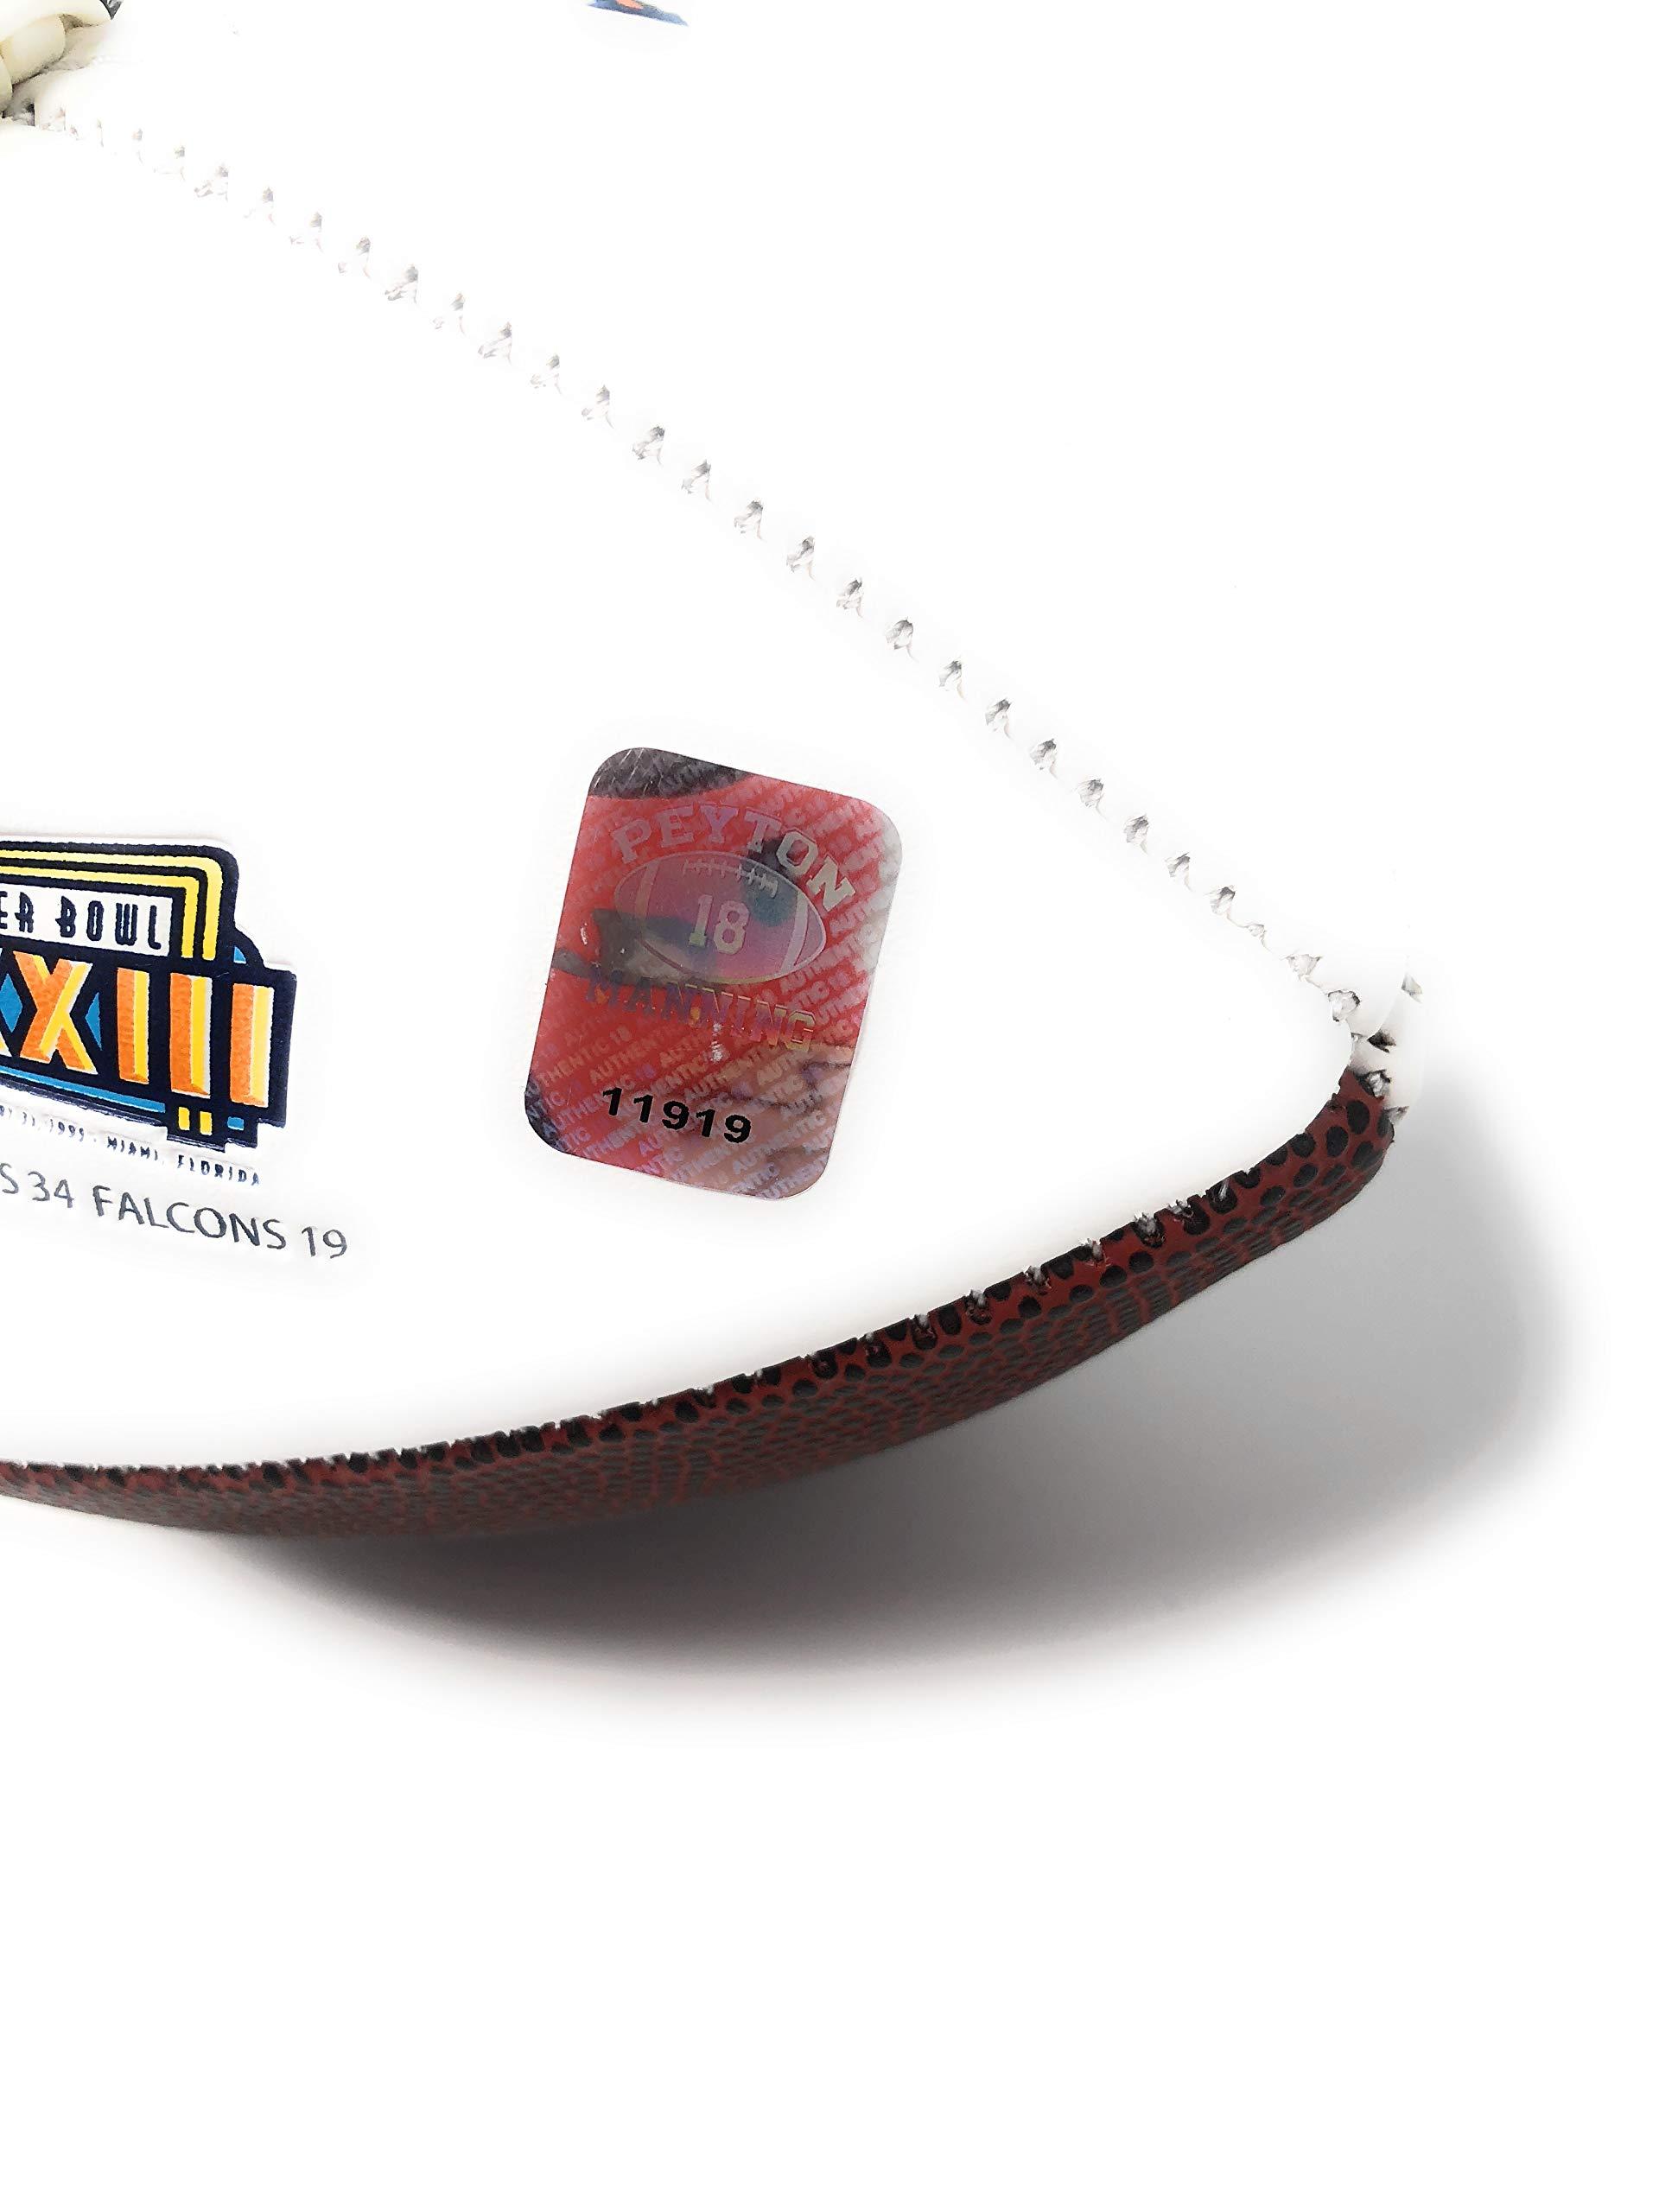 Peyton Manning Denver Broncos Signed Autograph Embroidered Logo Football Main Panel Manning Player Hologram